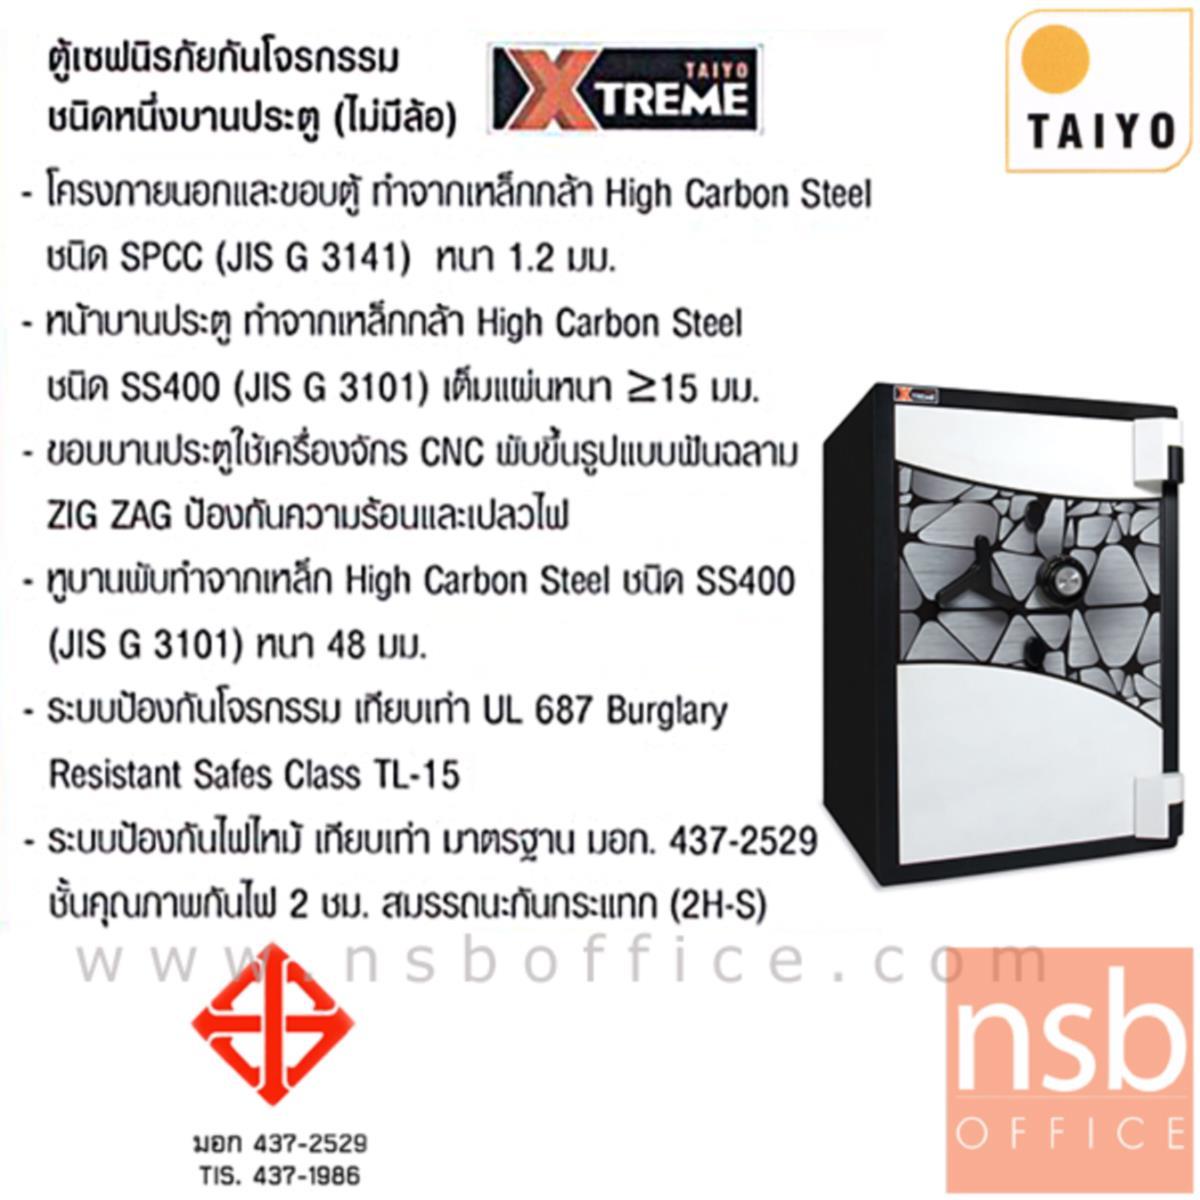 Taiyo Xtreme รุ่นพิเศษ น้ำหนัก 450 กก. 2 กุญแจ 1 รหัส